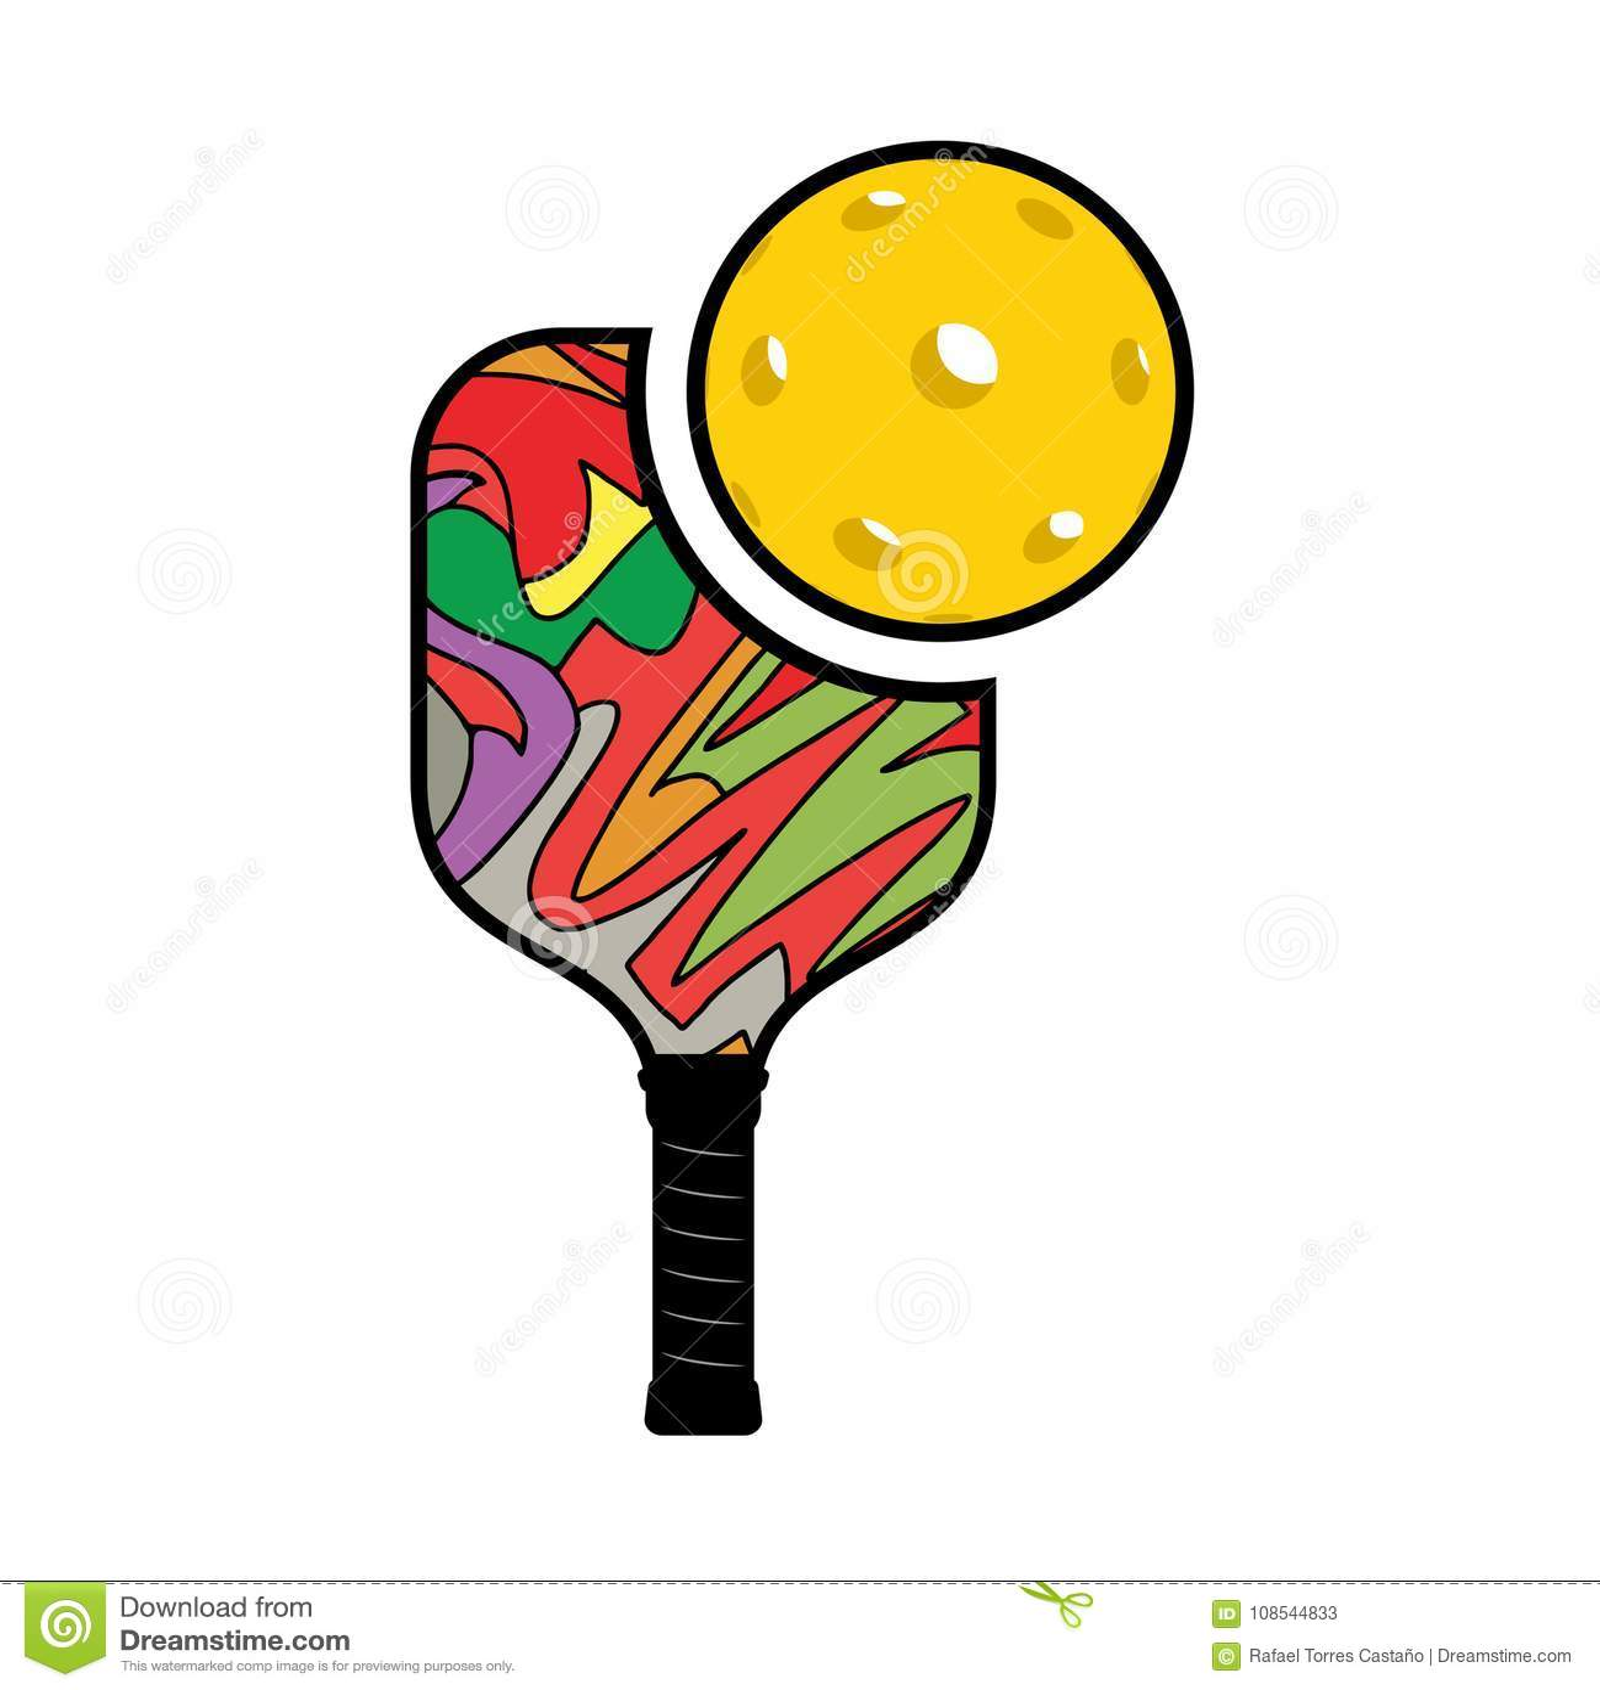 hight resolution of creative design of pickleball racket illustration